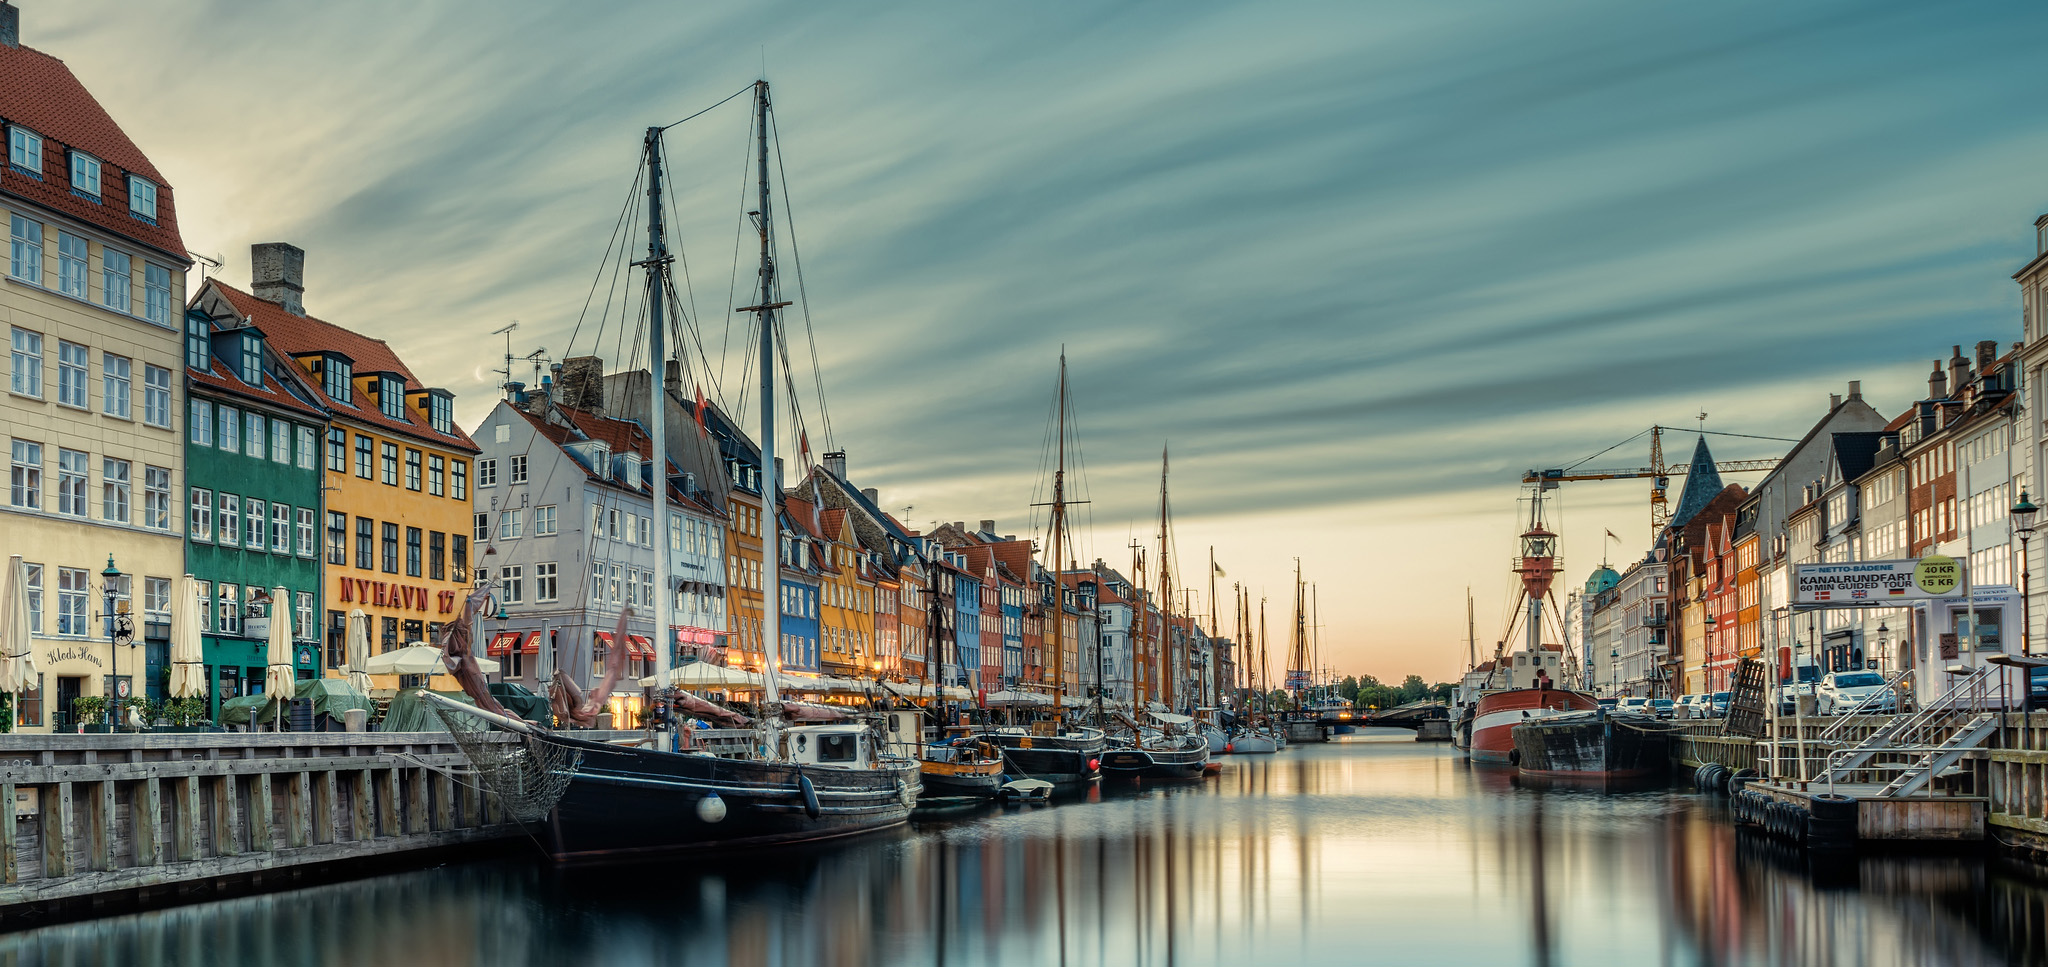 Rising sea levels jeopardise the historic Nyhavn district in Copenhagen. (Photo credit: Jacob Surland, flickr)